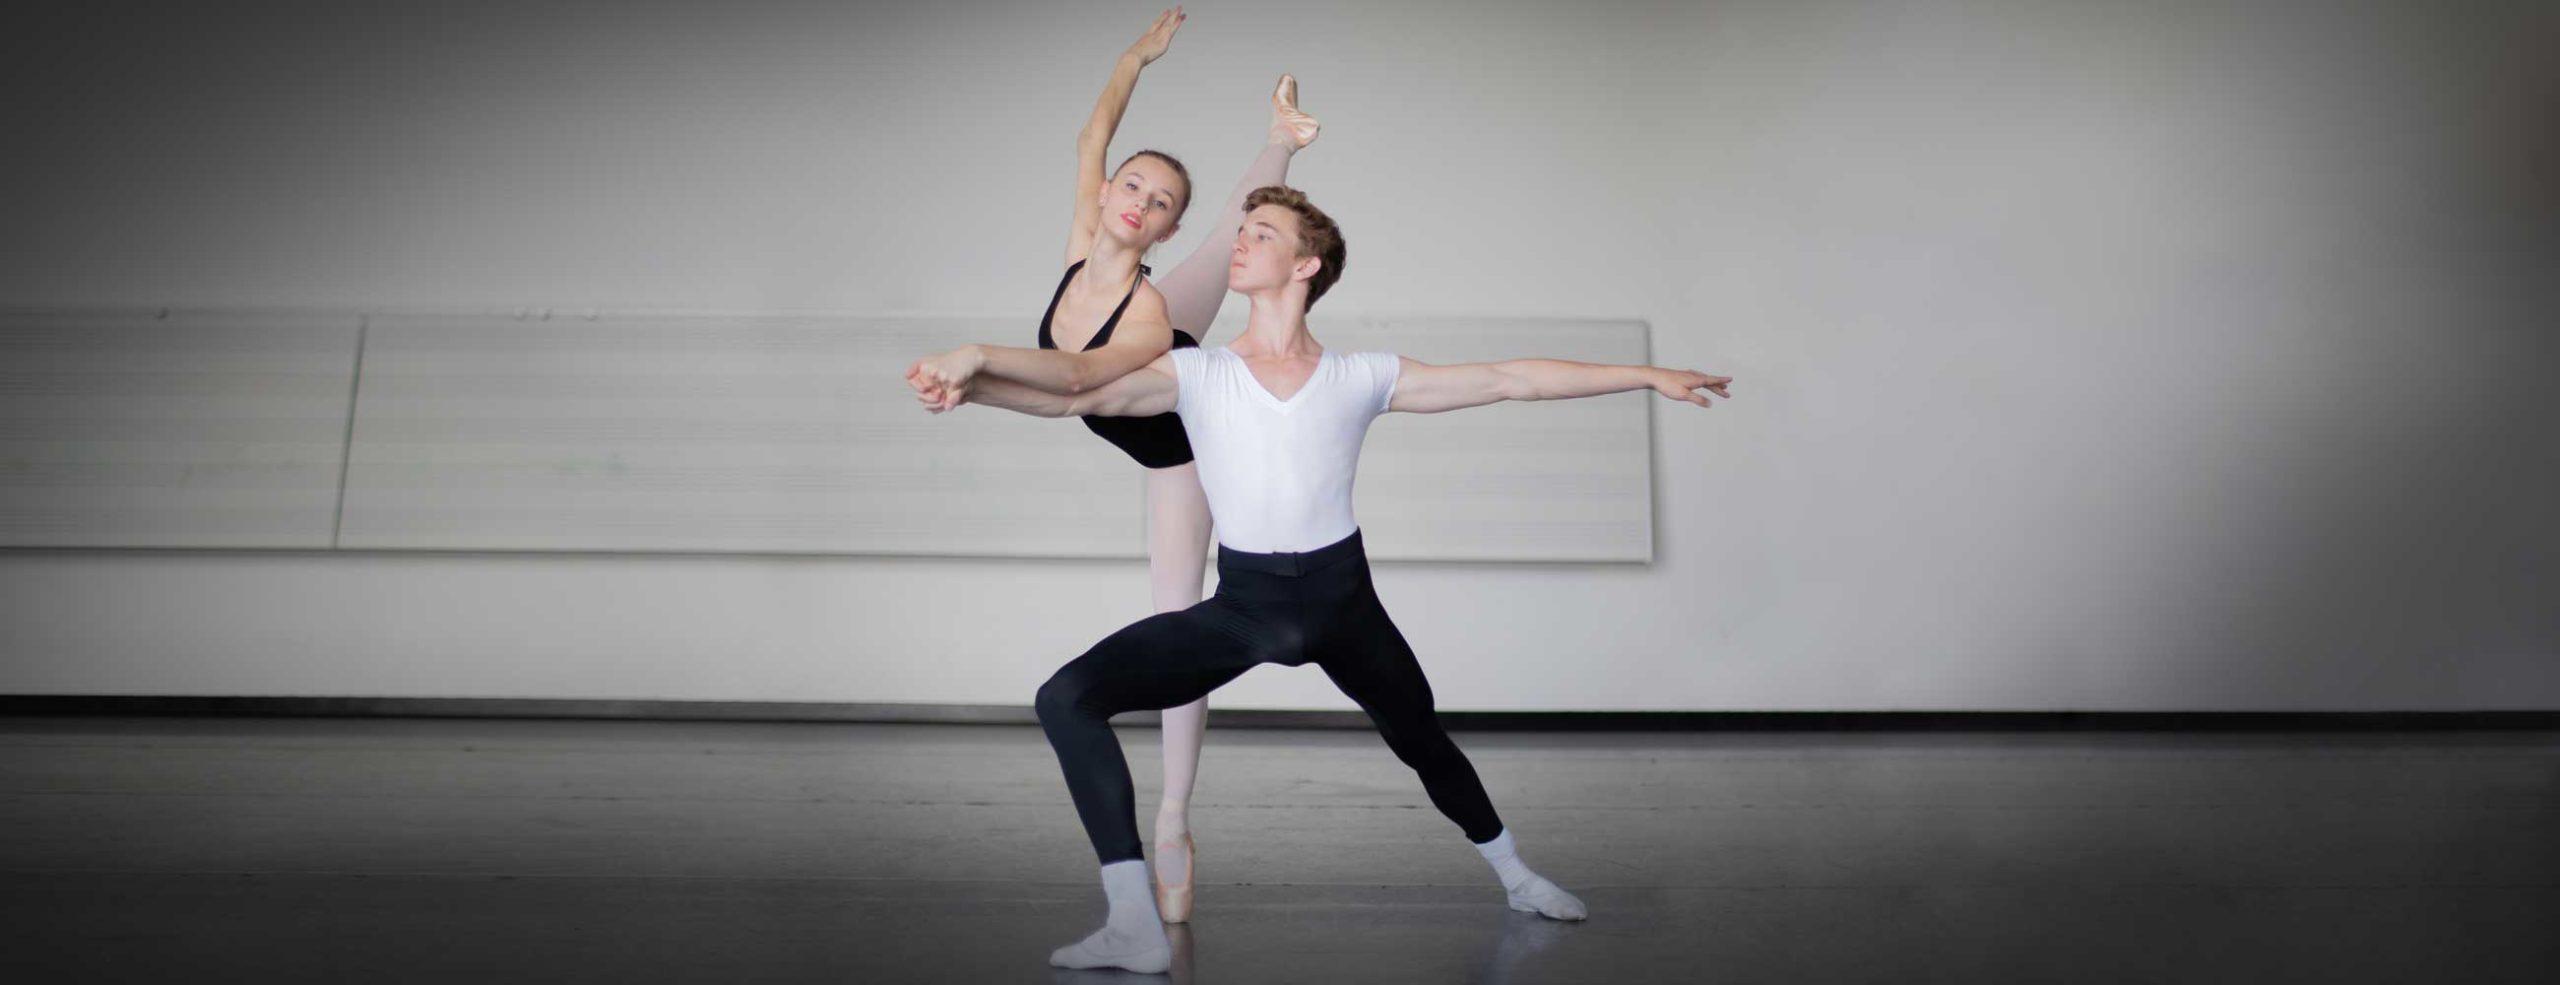 Colburn Dance Academy students posing